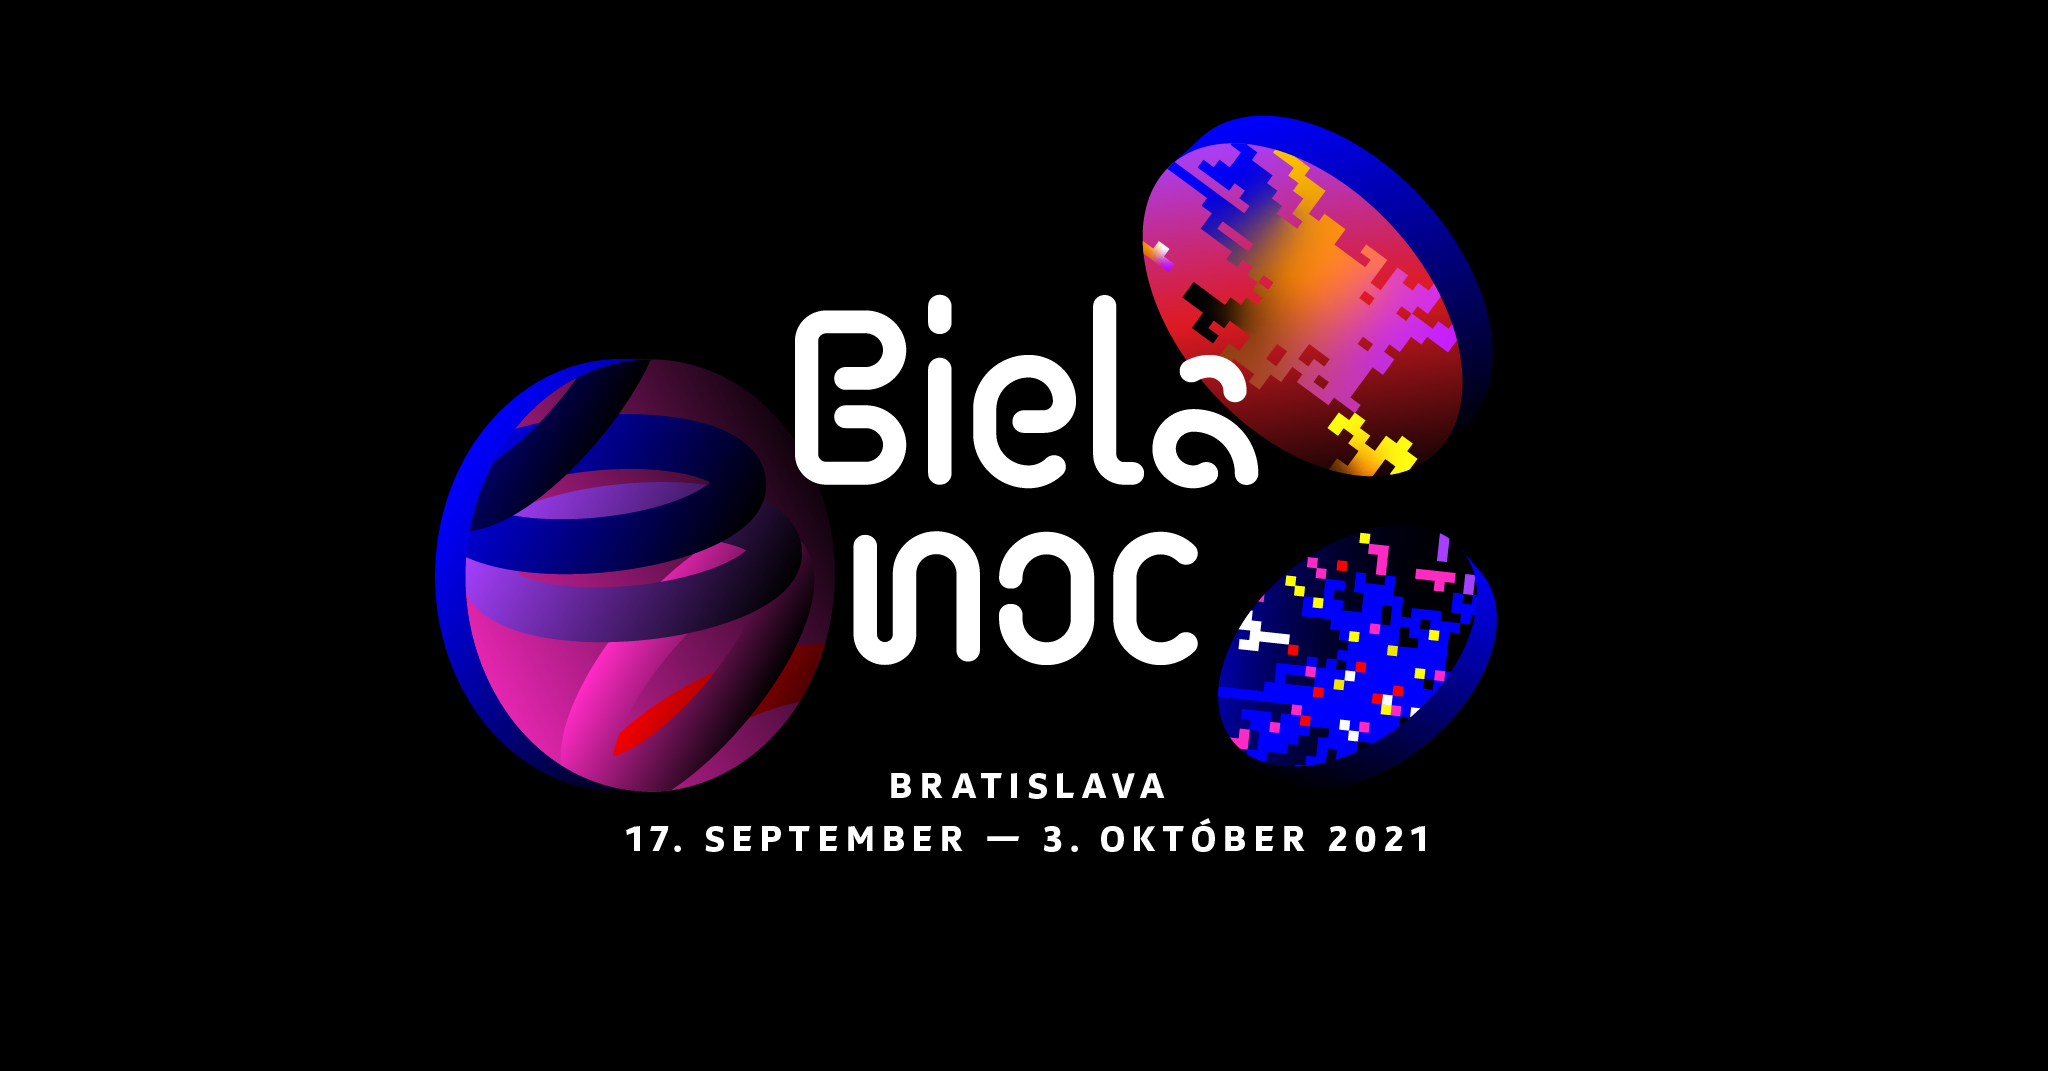 Biela noc Bratislava 2021 - 17.9. - 3.10.2021